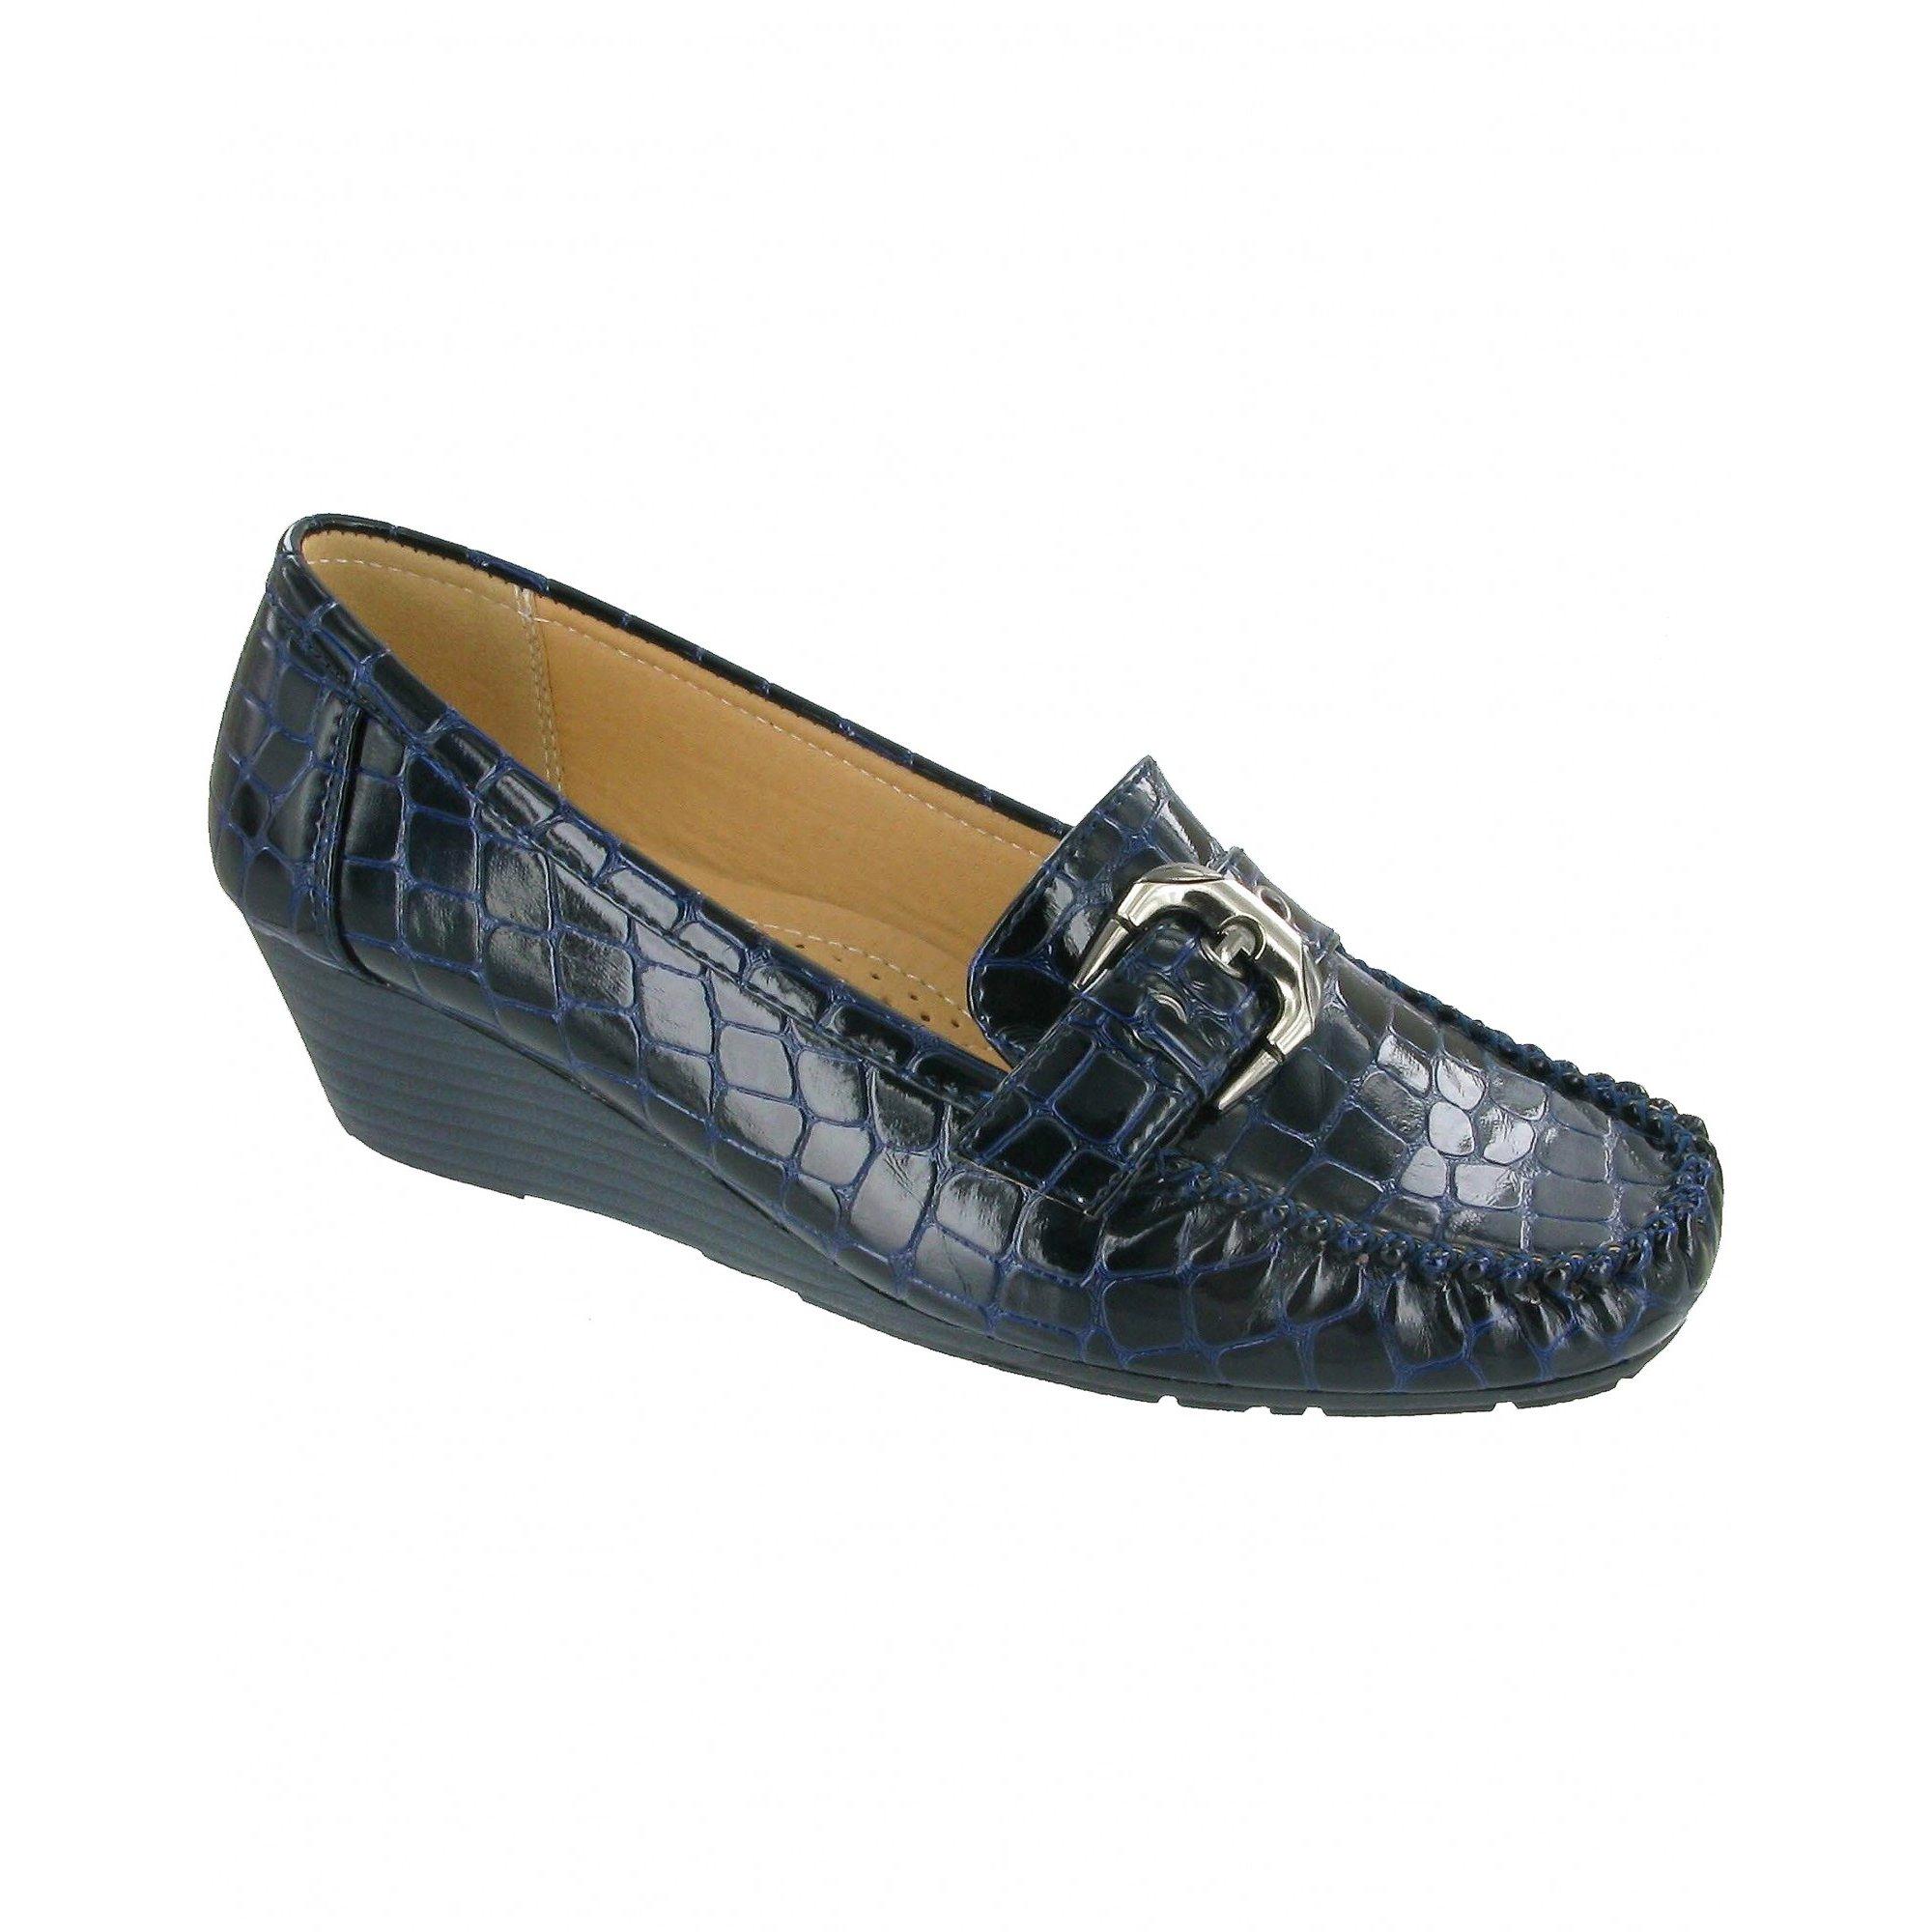 Amblers Hula Ladies Slip On Shoes / Womens Shoes (FS2388)